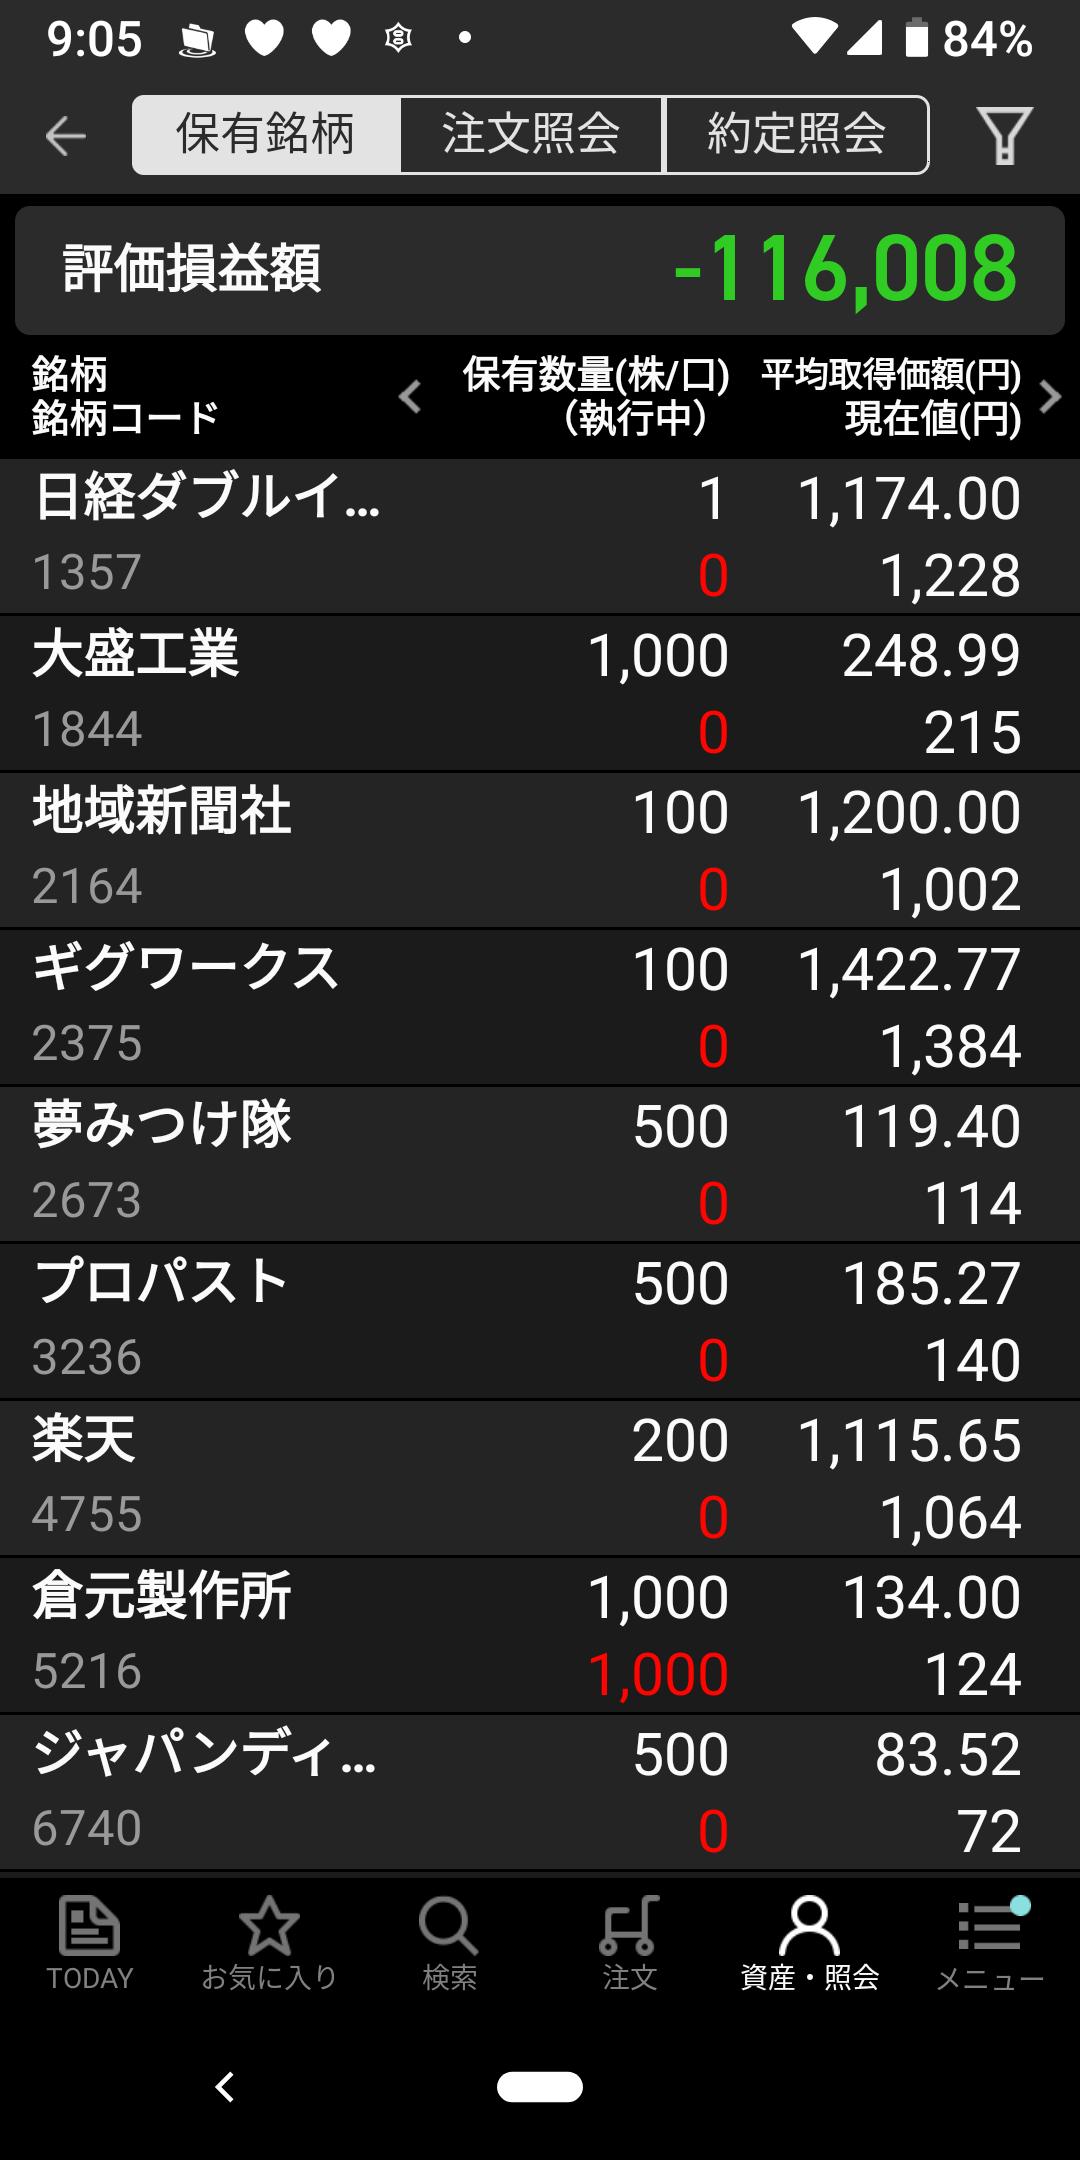 Screenshot (2019_08_08 9_05_48)